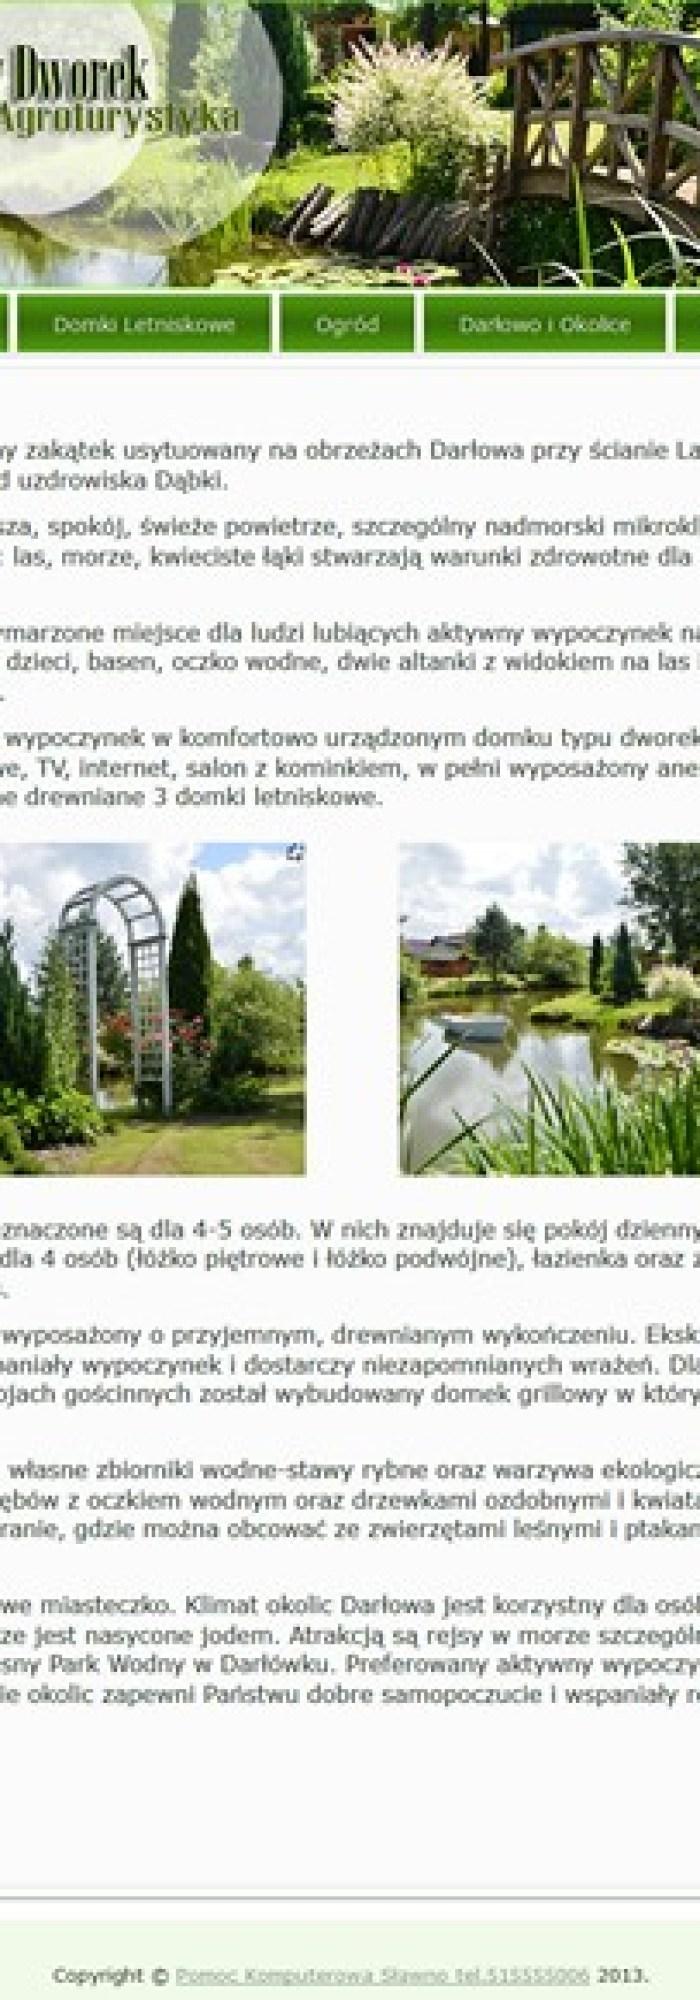 Leśny Dworek Agroturystyka